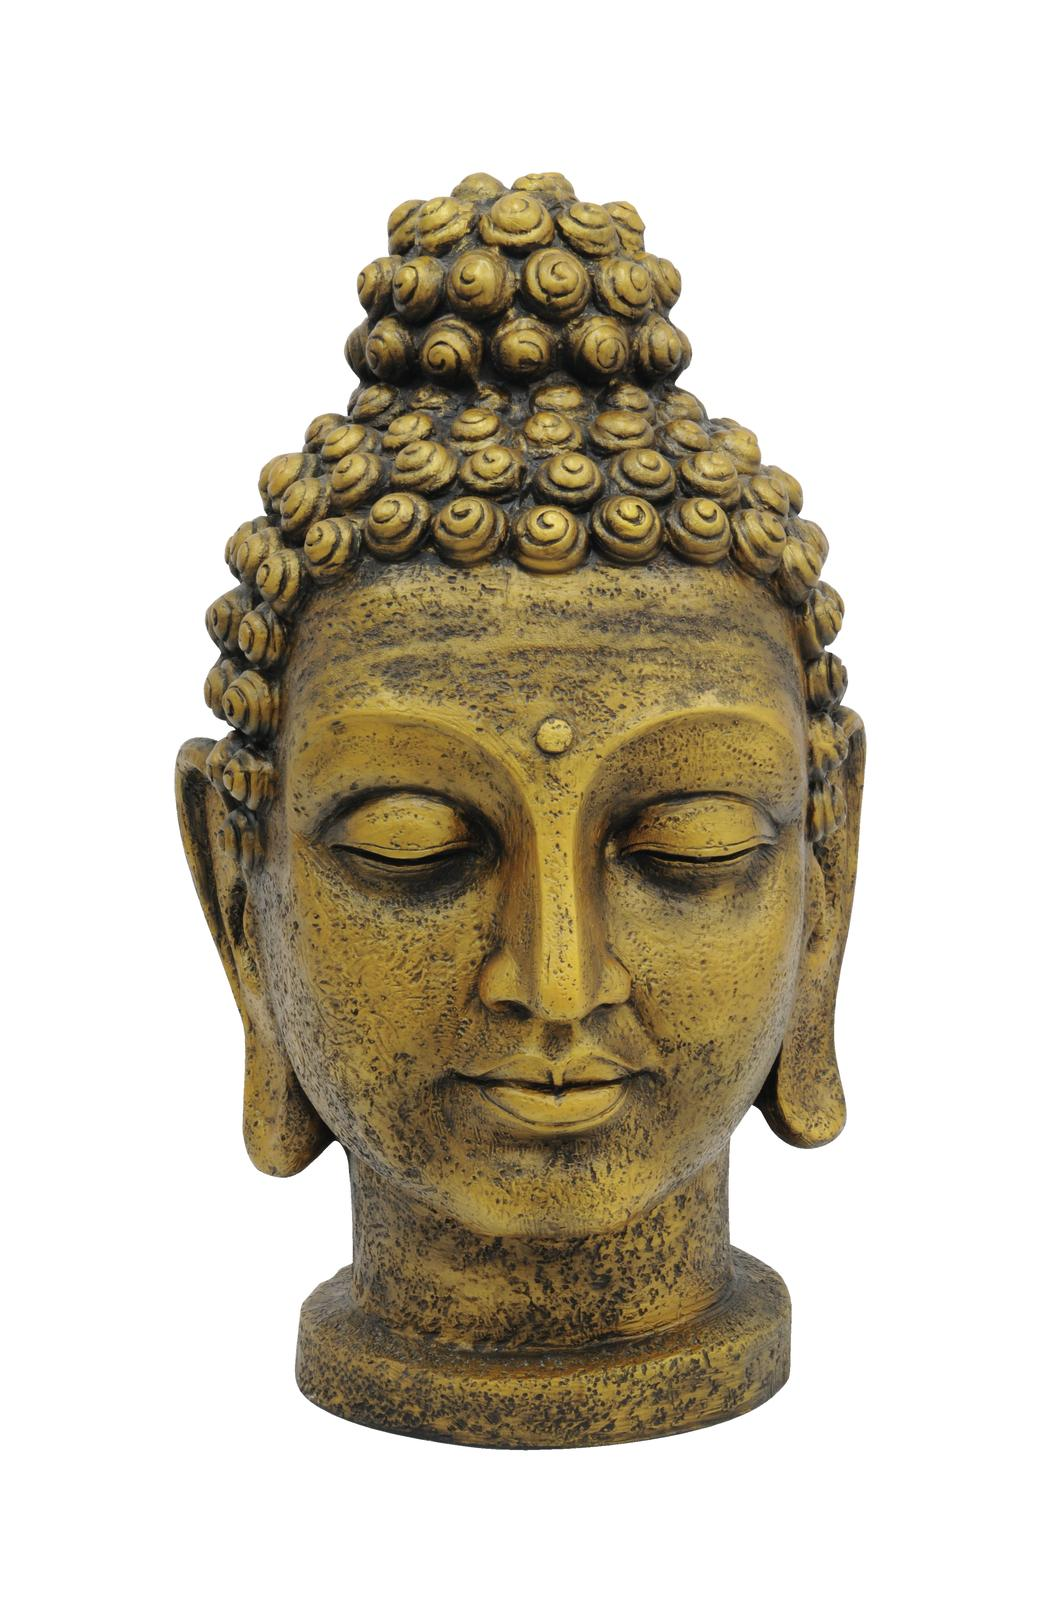 Socha hlava Budhy, zlatá, 75 cm